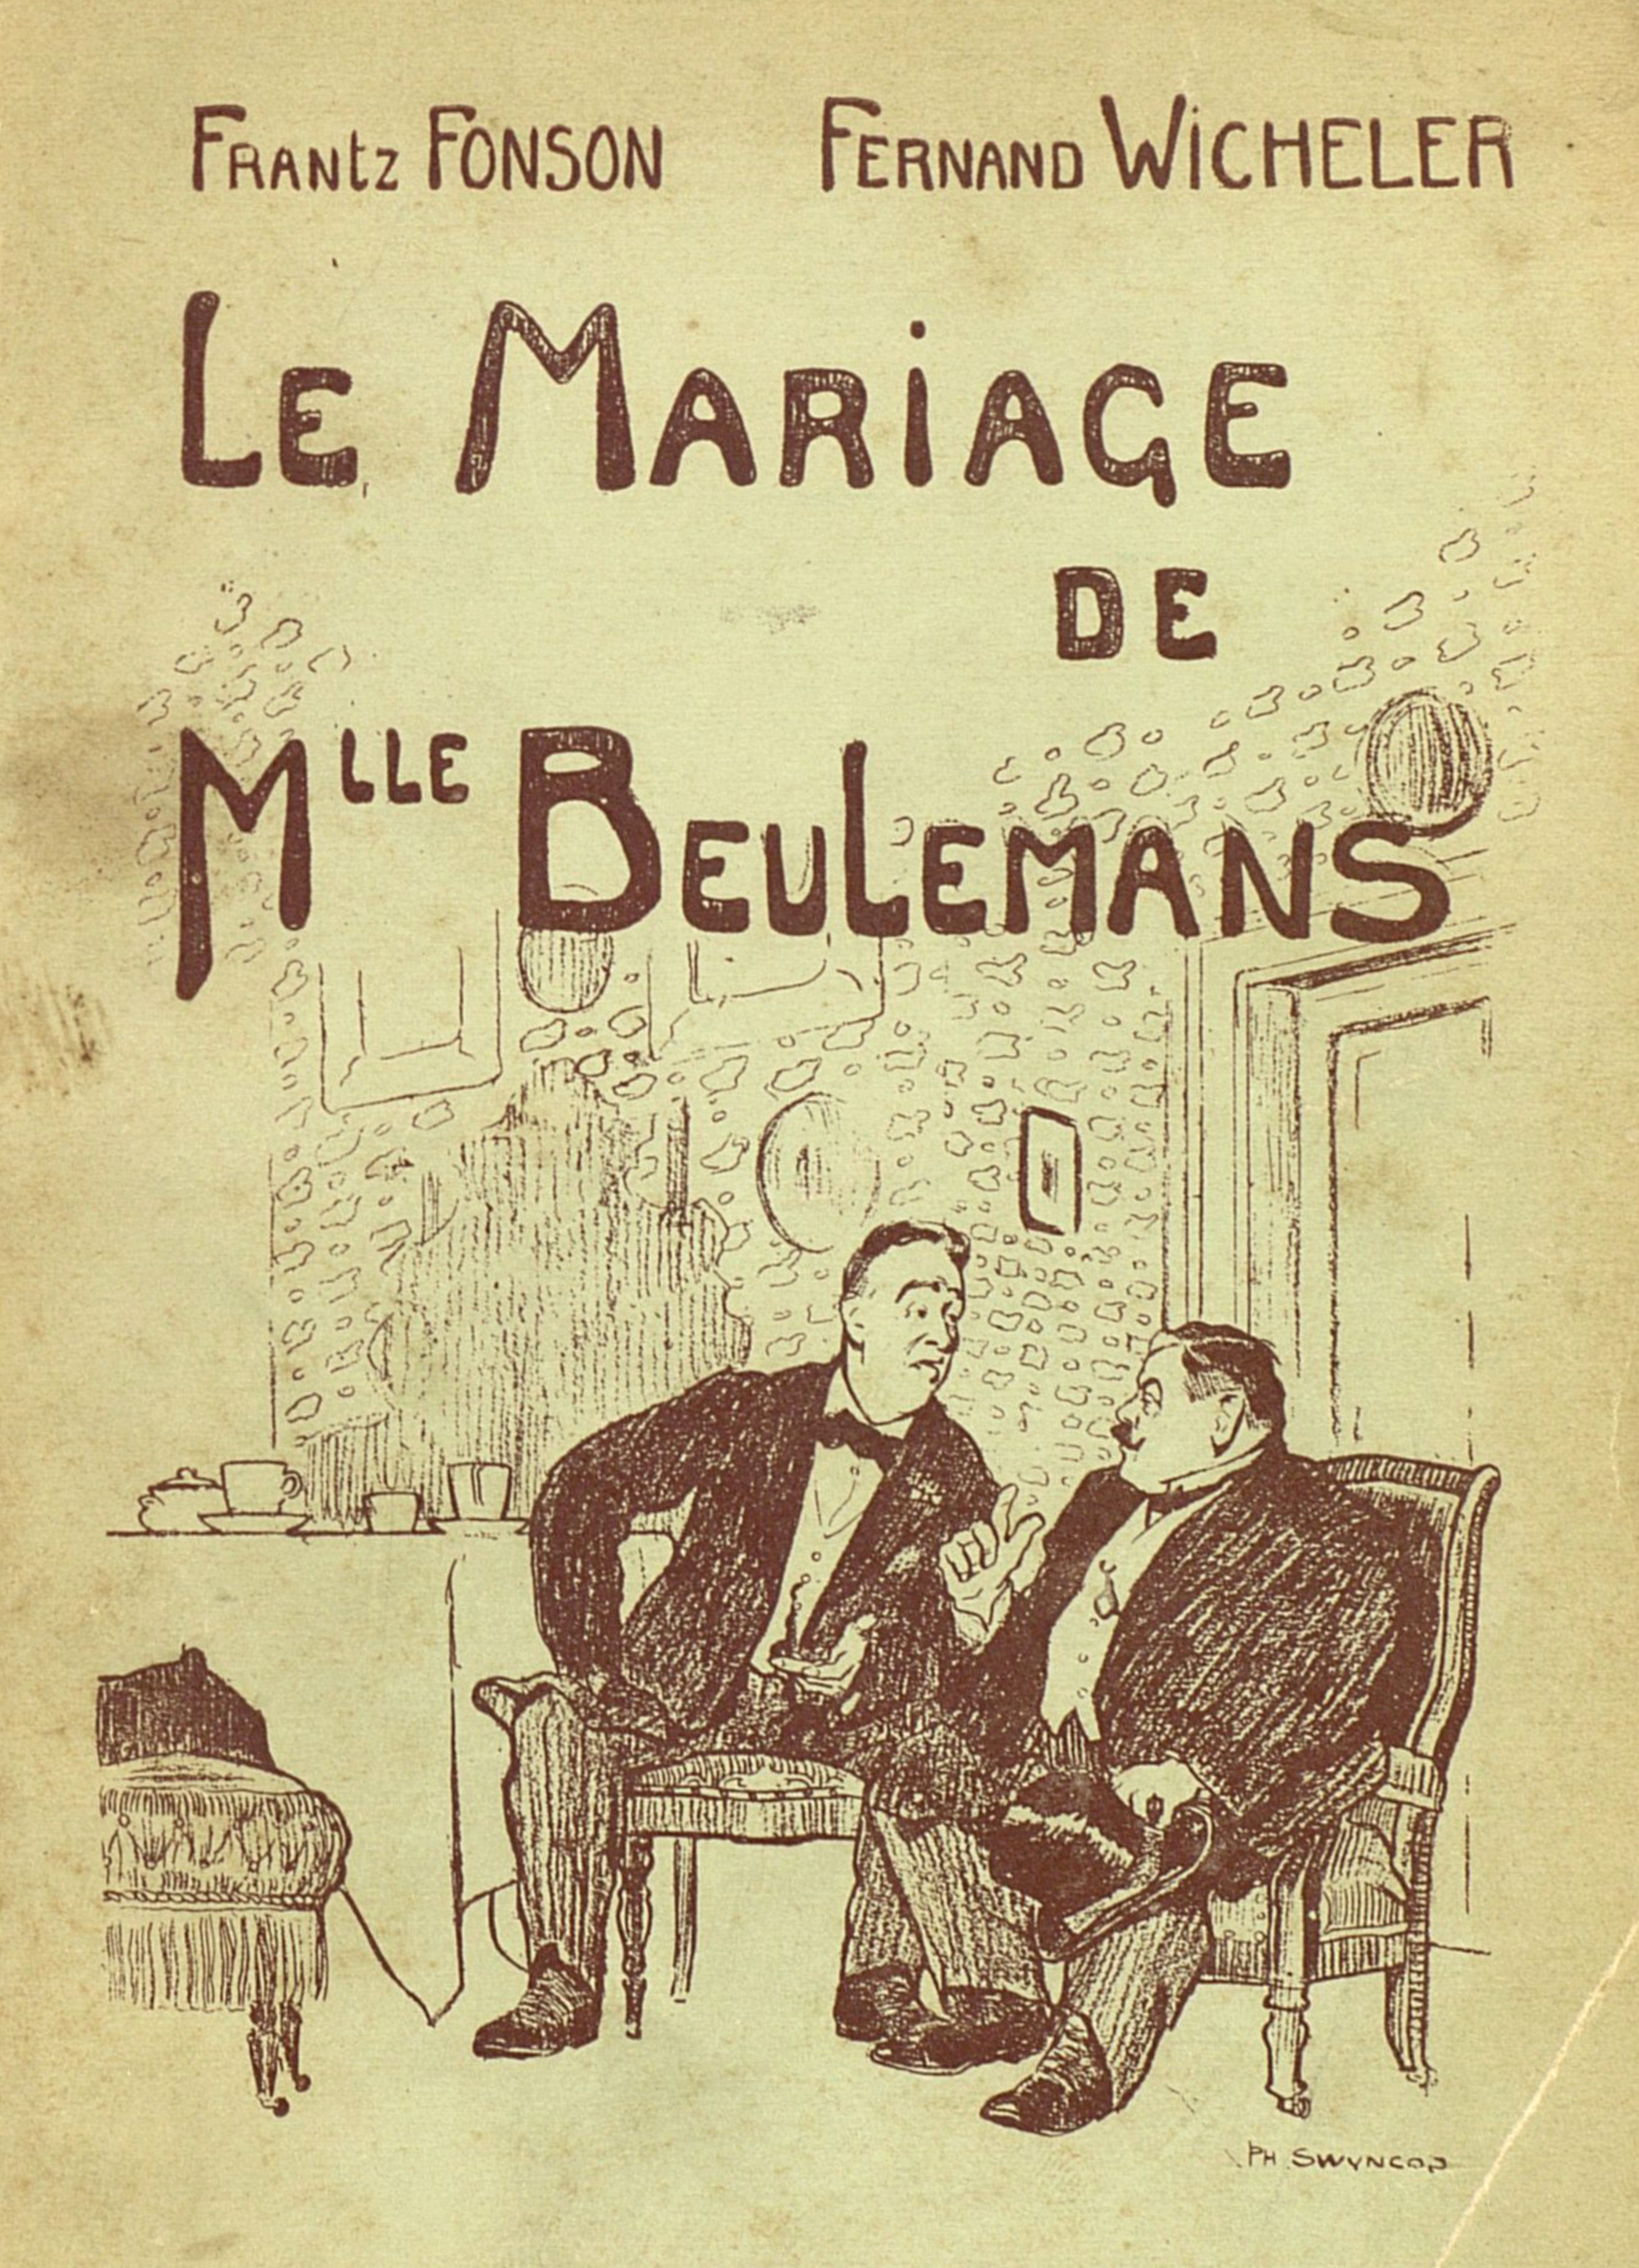 Le Mariage De Mademoiselle Beulemans Wikipedia